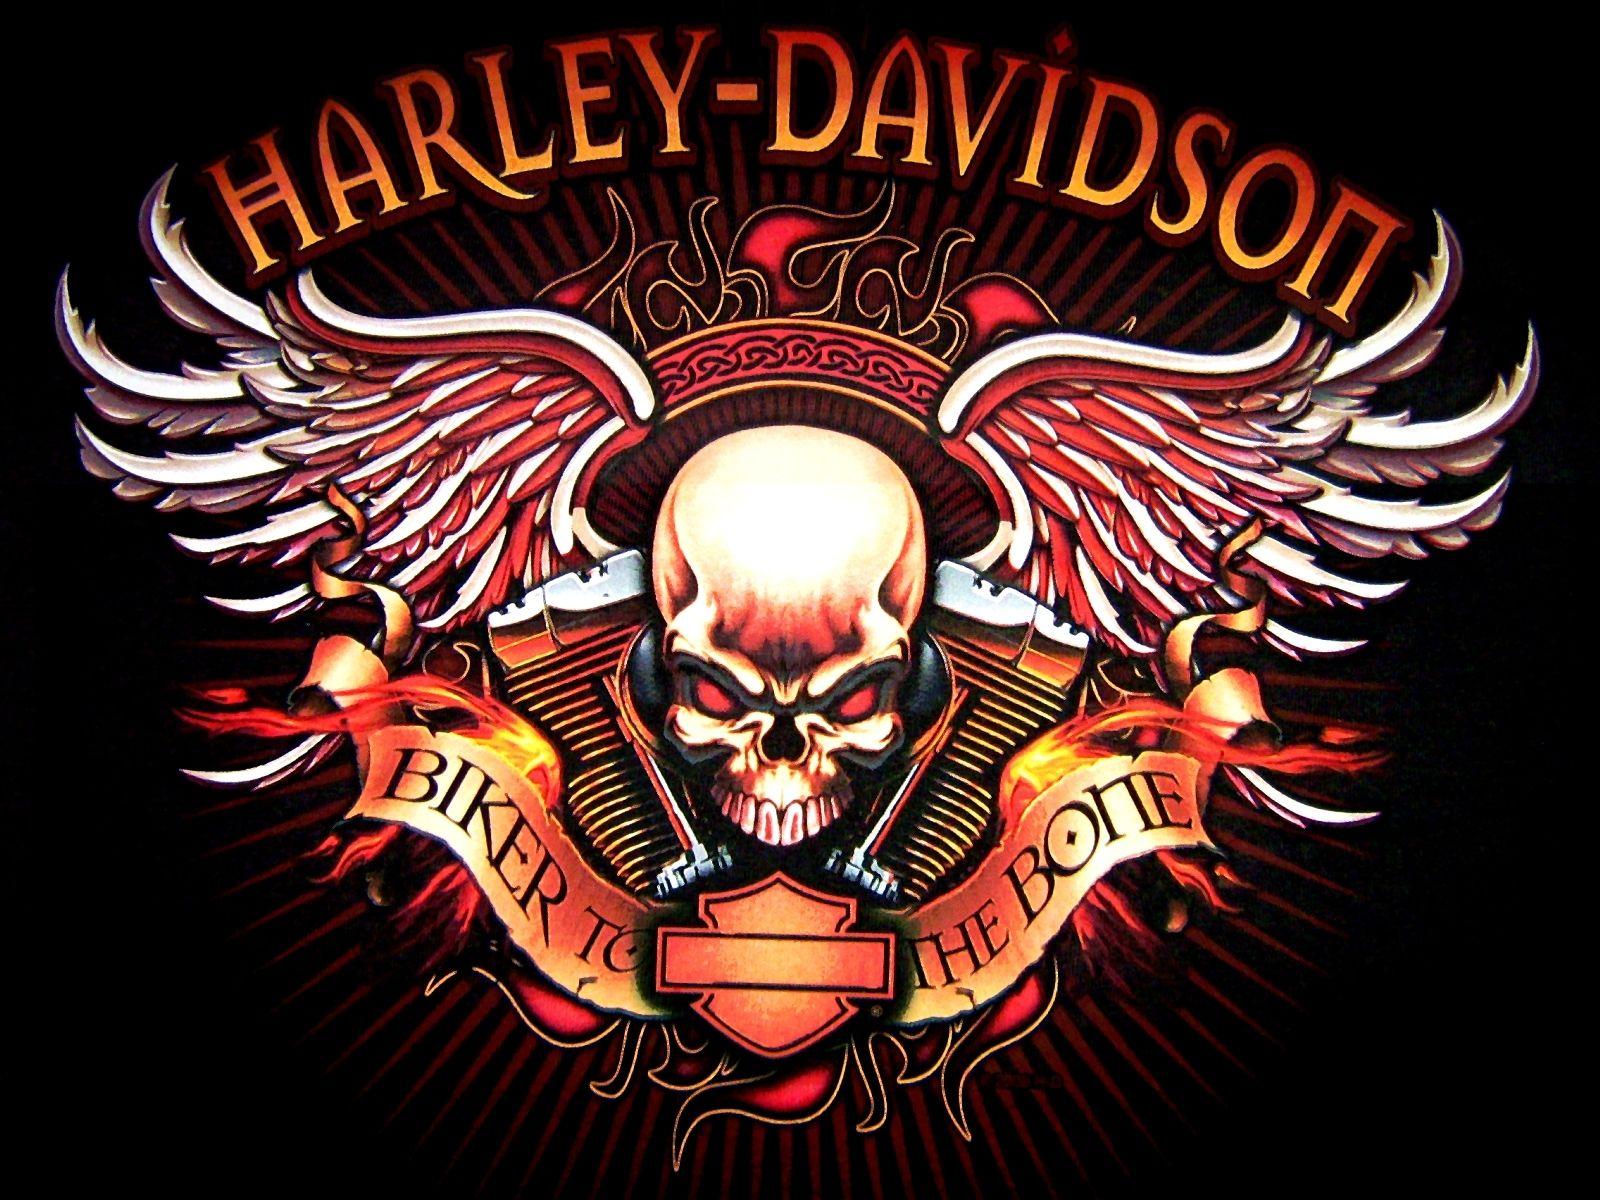 Hd skull wallpapers harley davidson logo skull bikes motorcycle wallpaper background